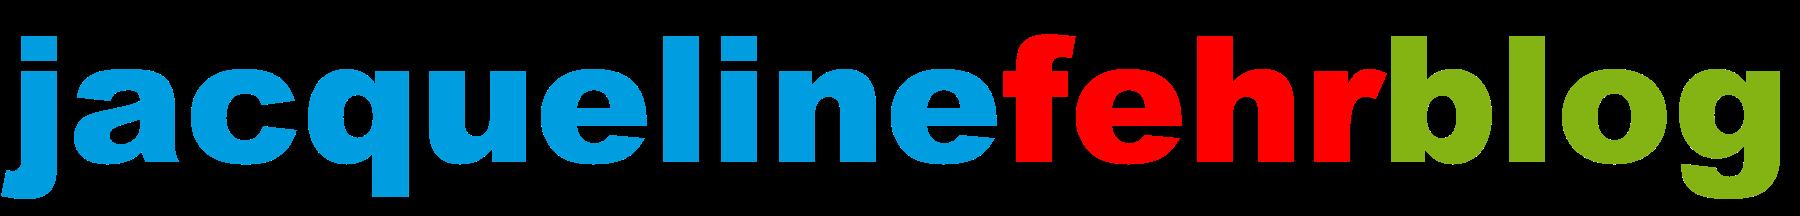 jacqueline-fehr.blog Logo